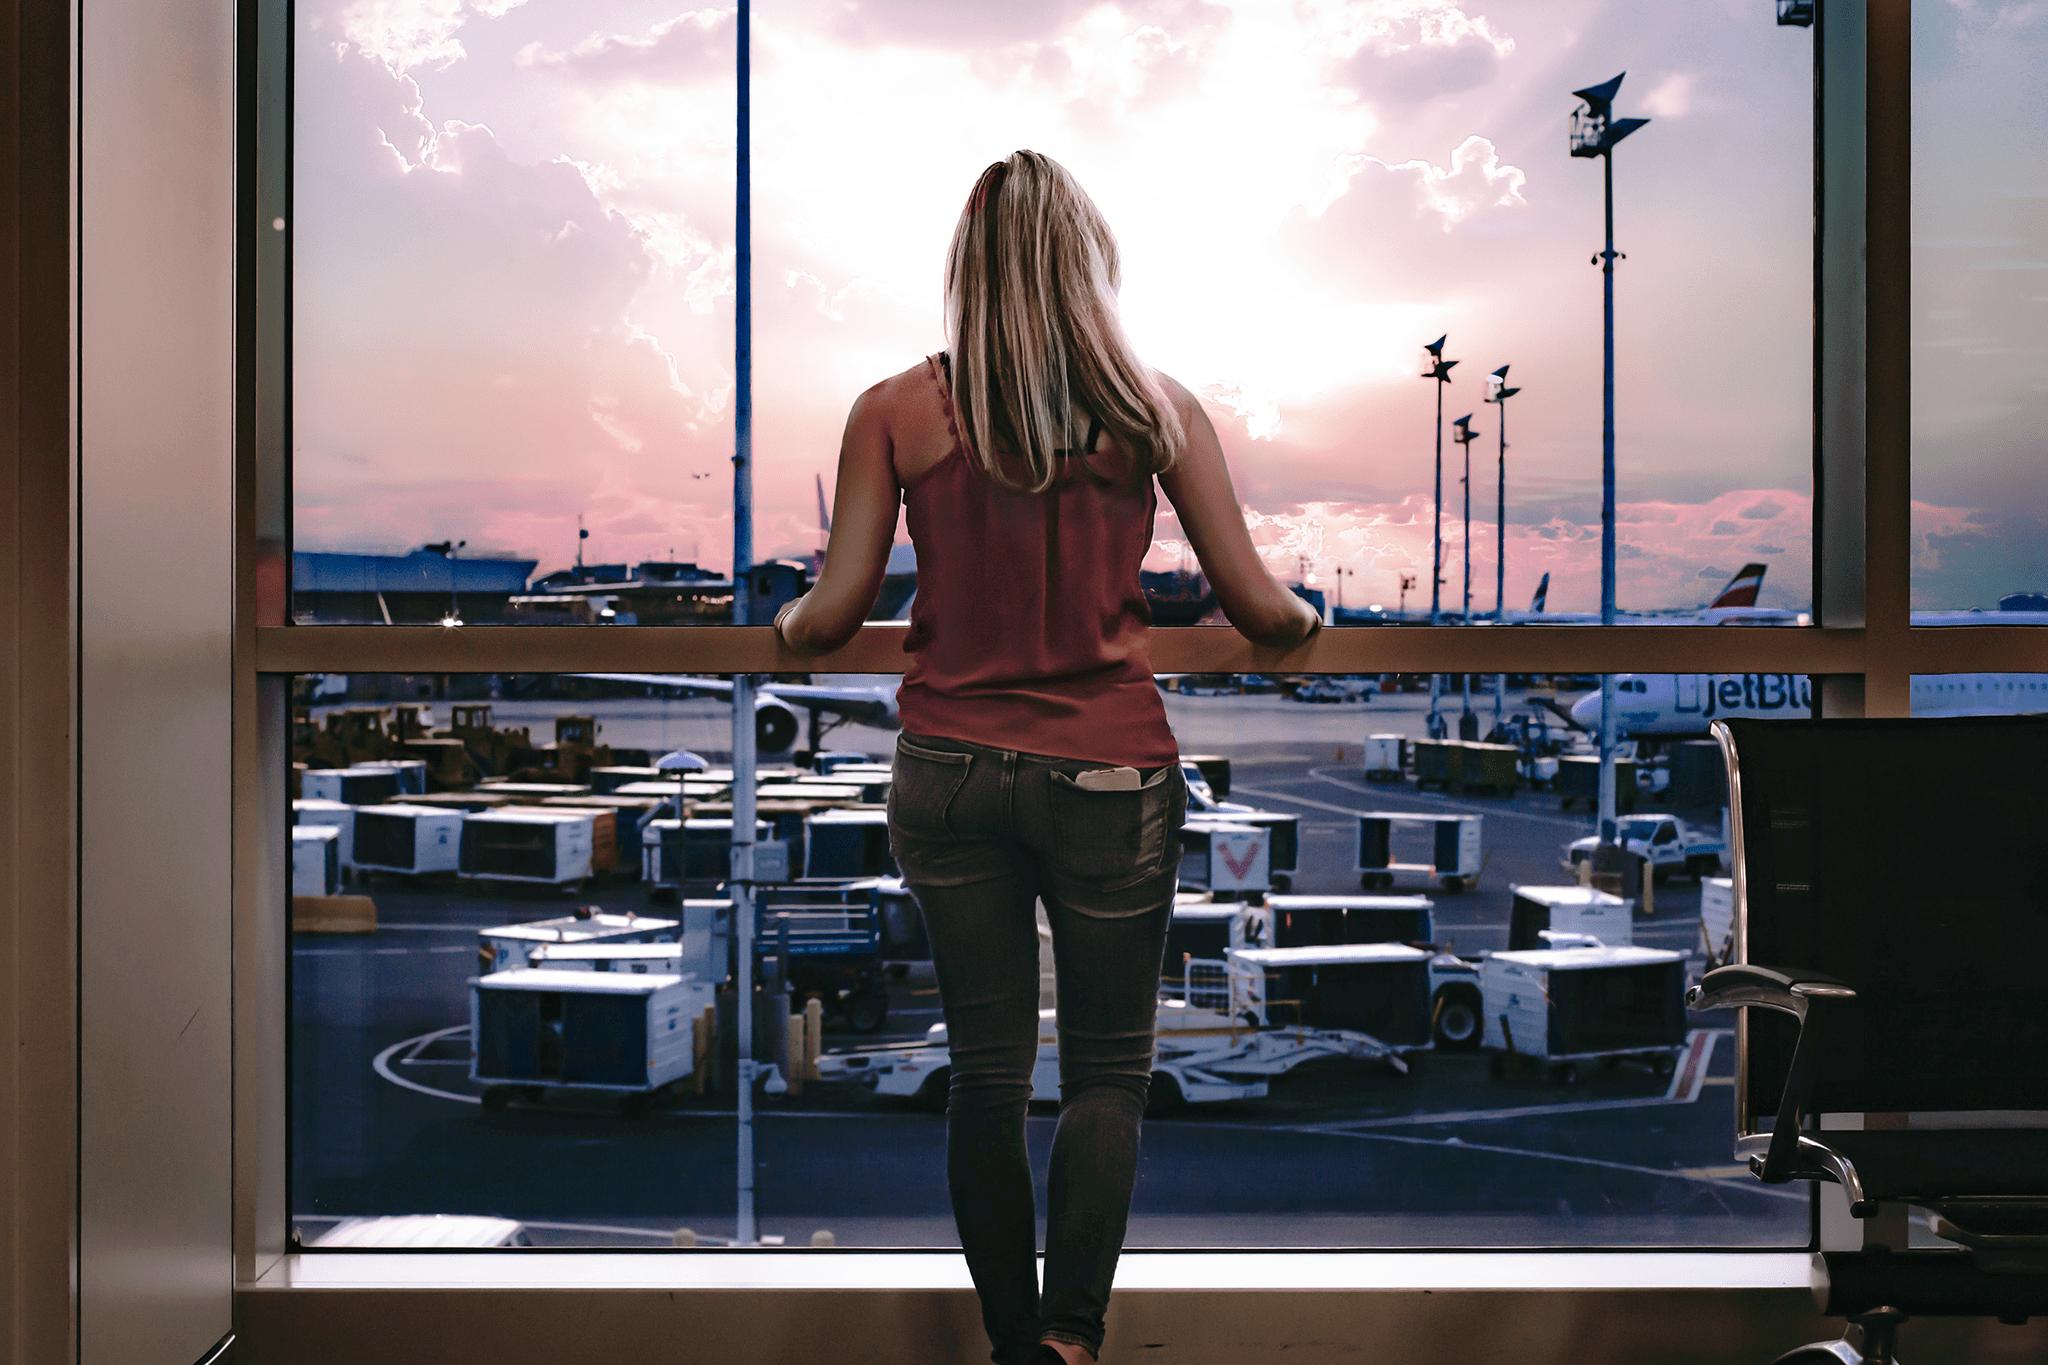 Woman at airport sacramento davis california